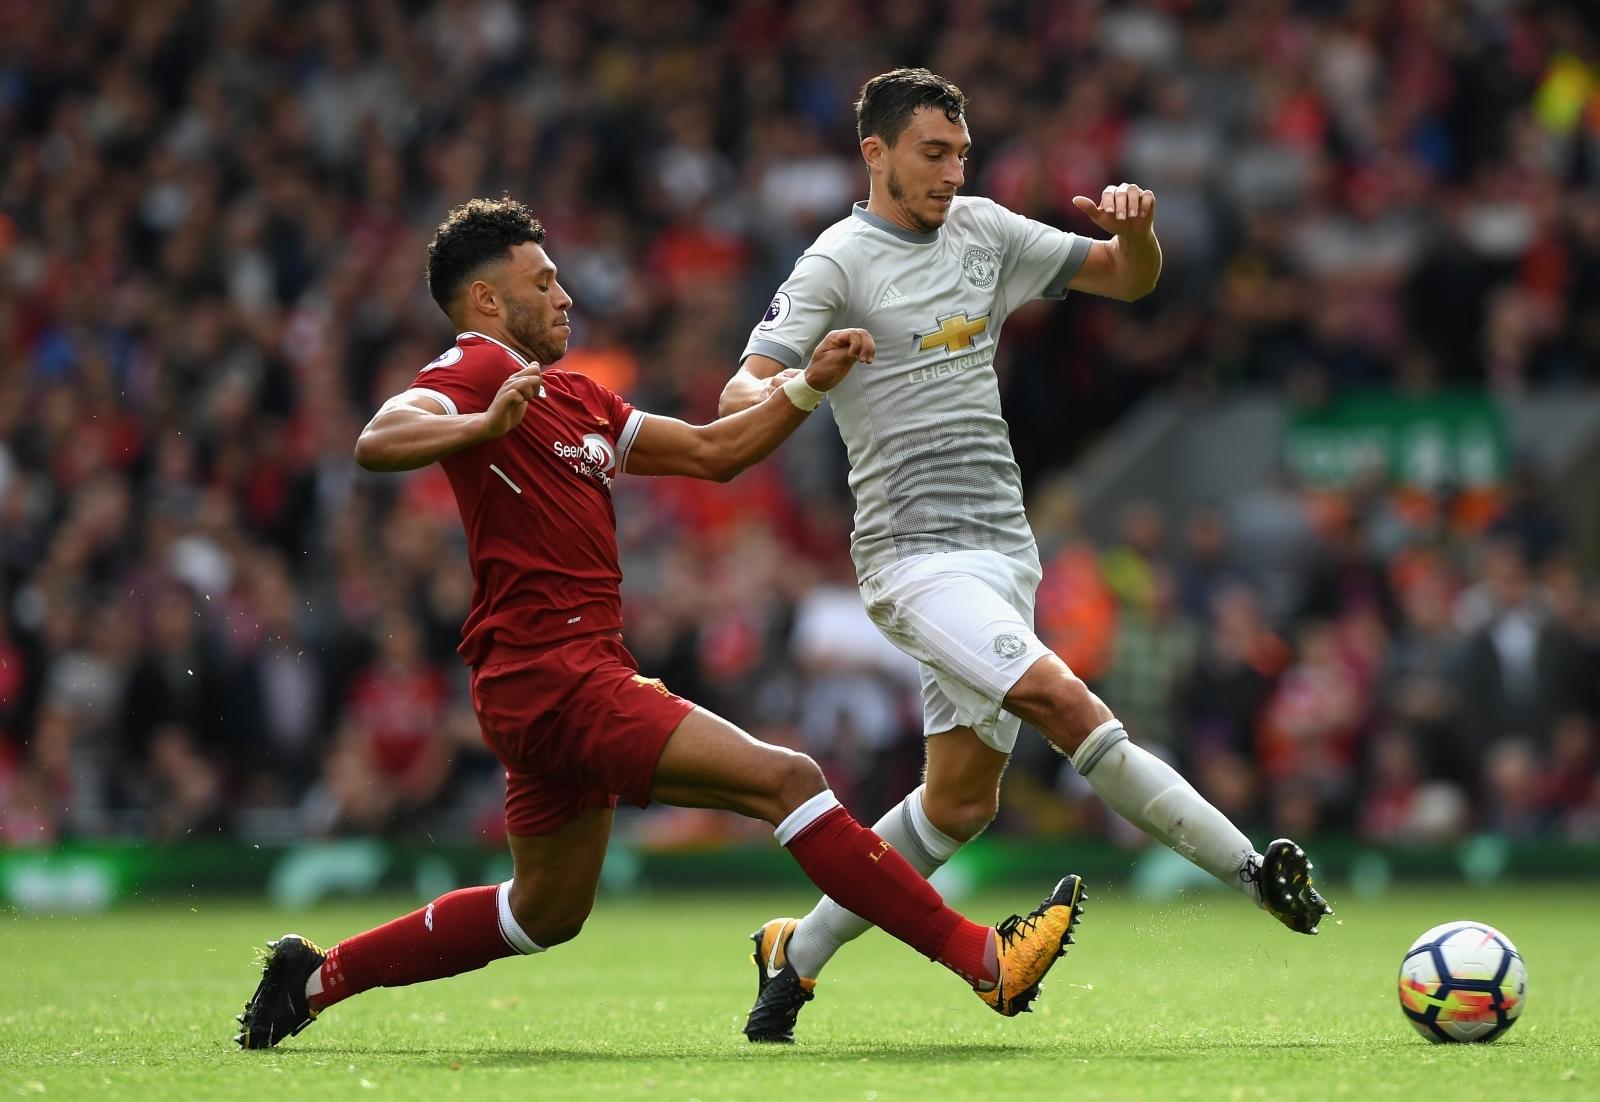 Jurgen Klopp: 'Alex Oxlade-Chamberlain needs more time to adapt'